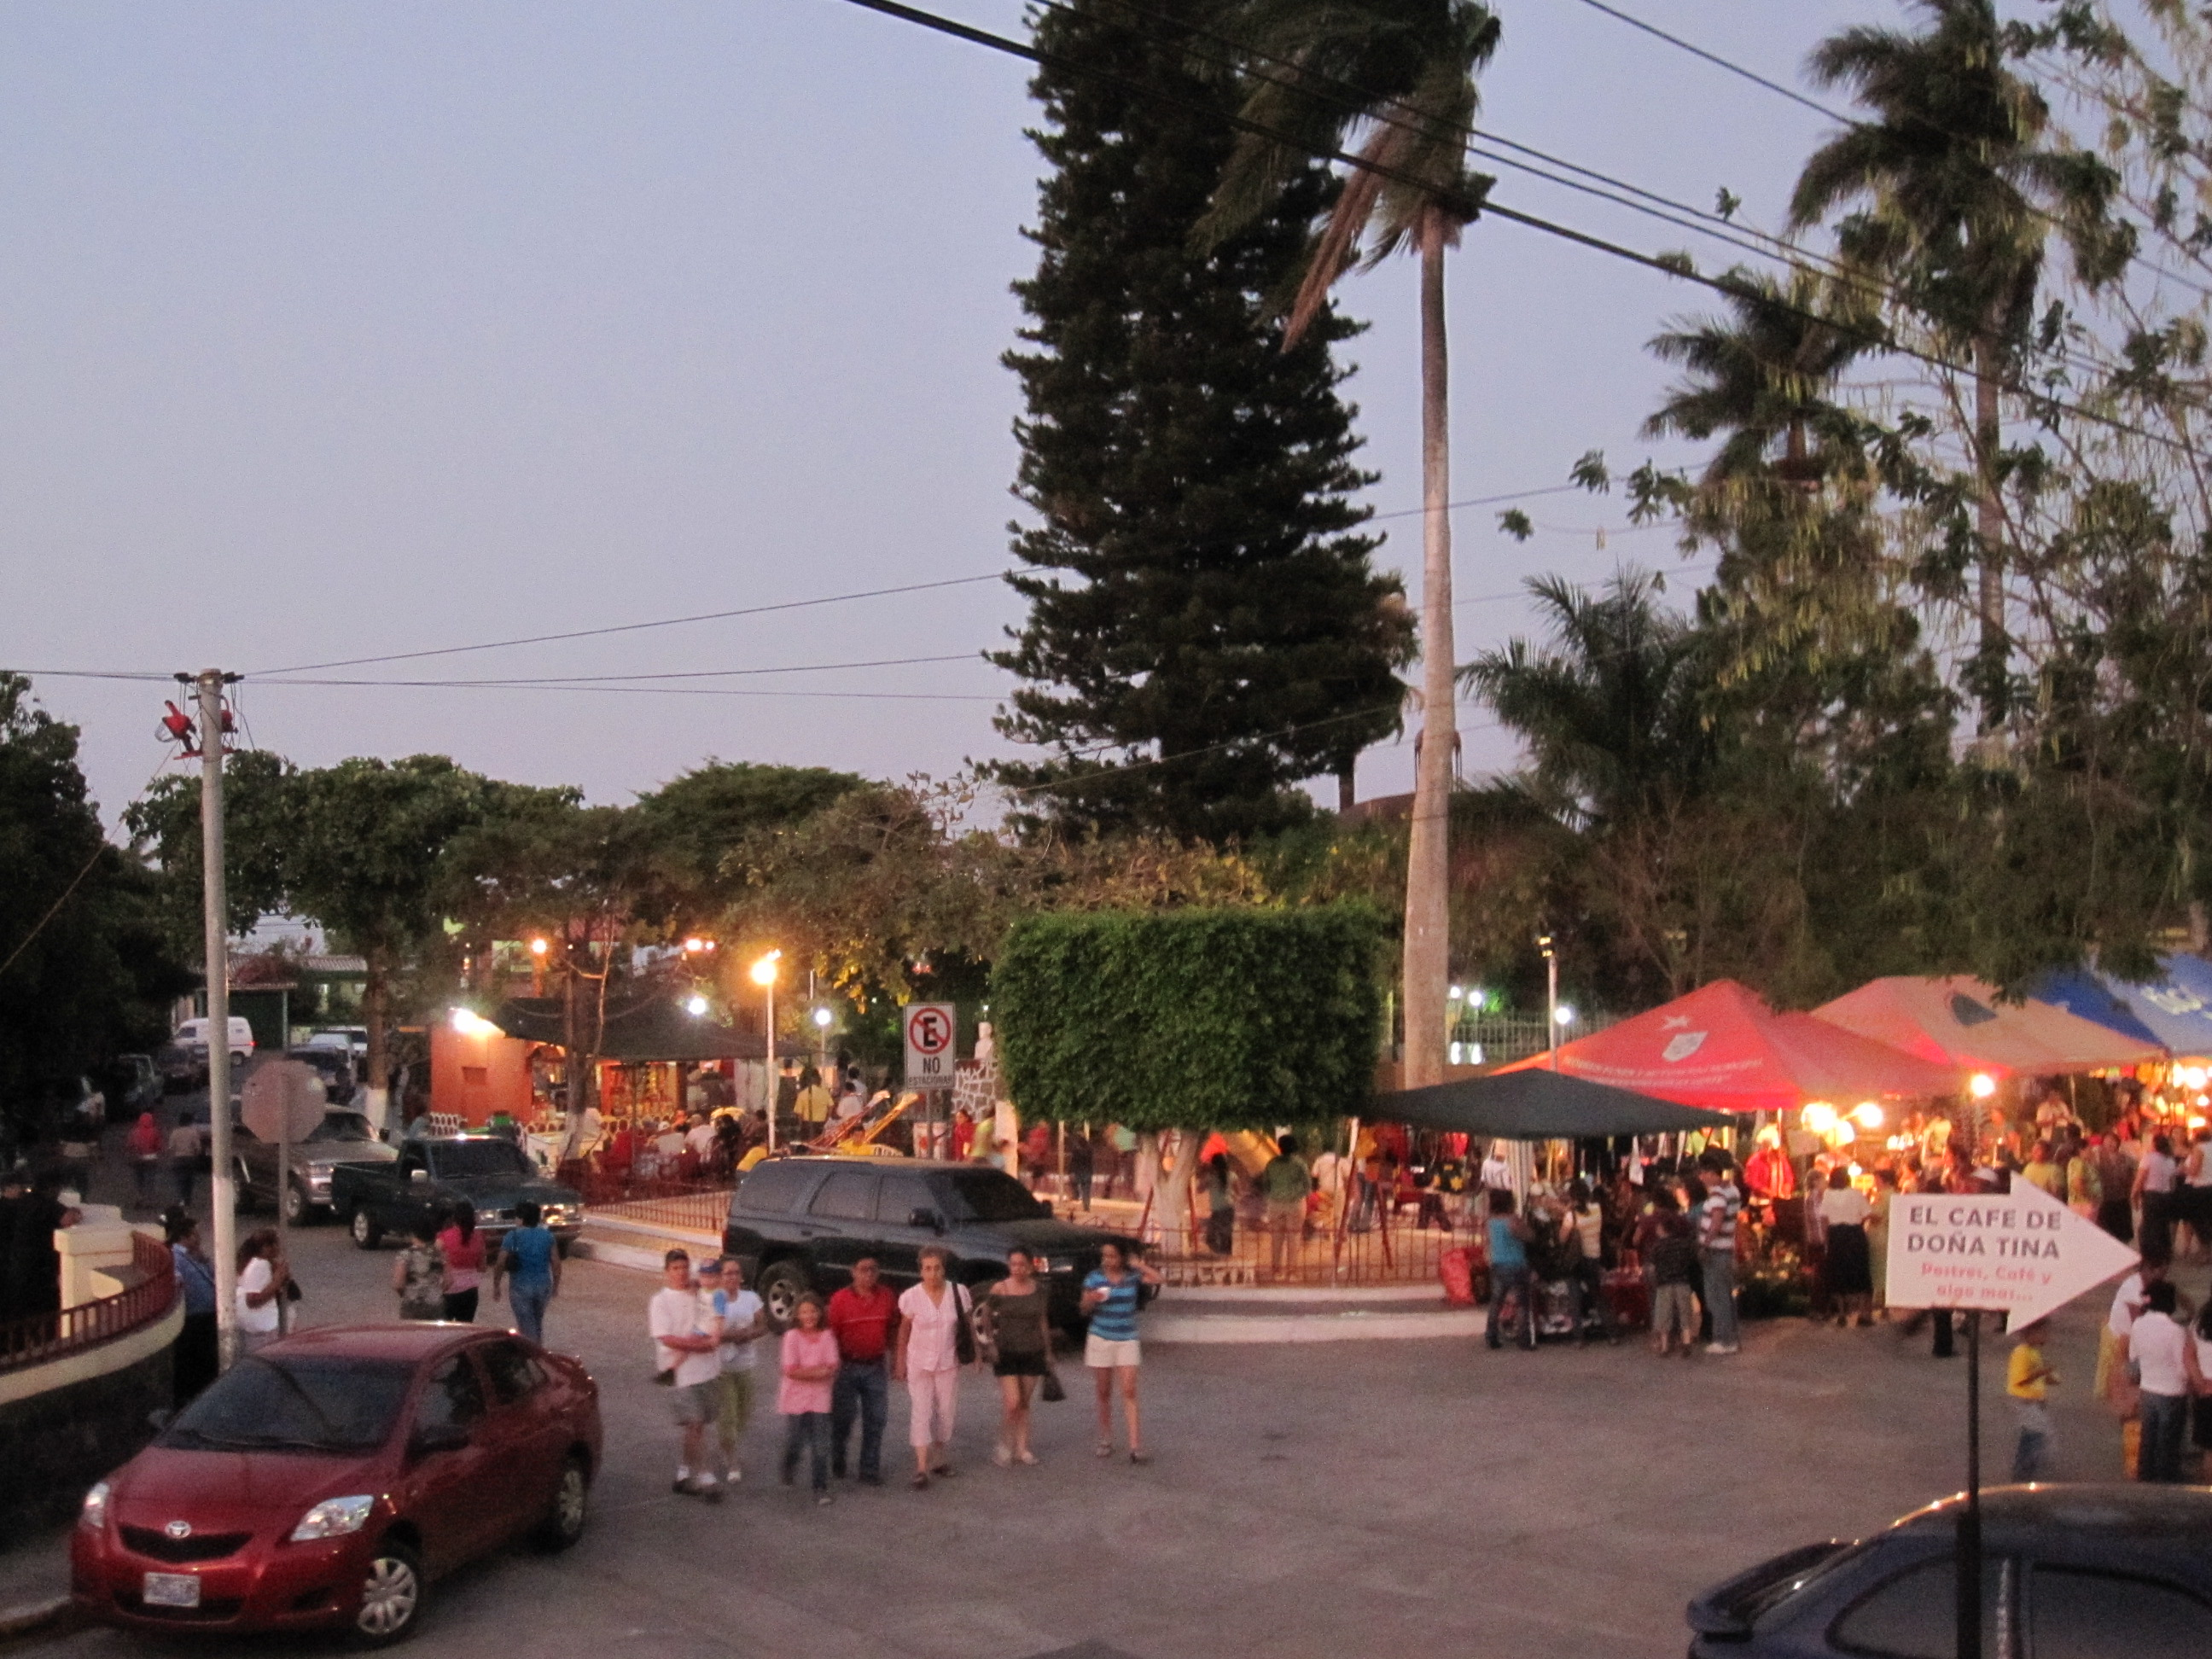 Semana Santa celebrations, Alegria